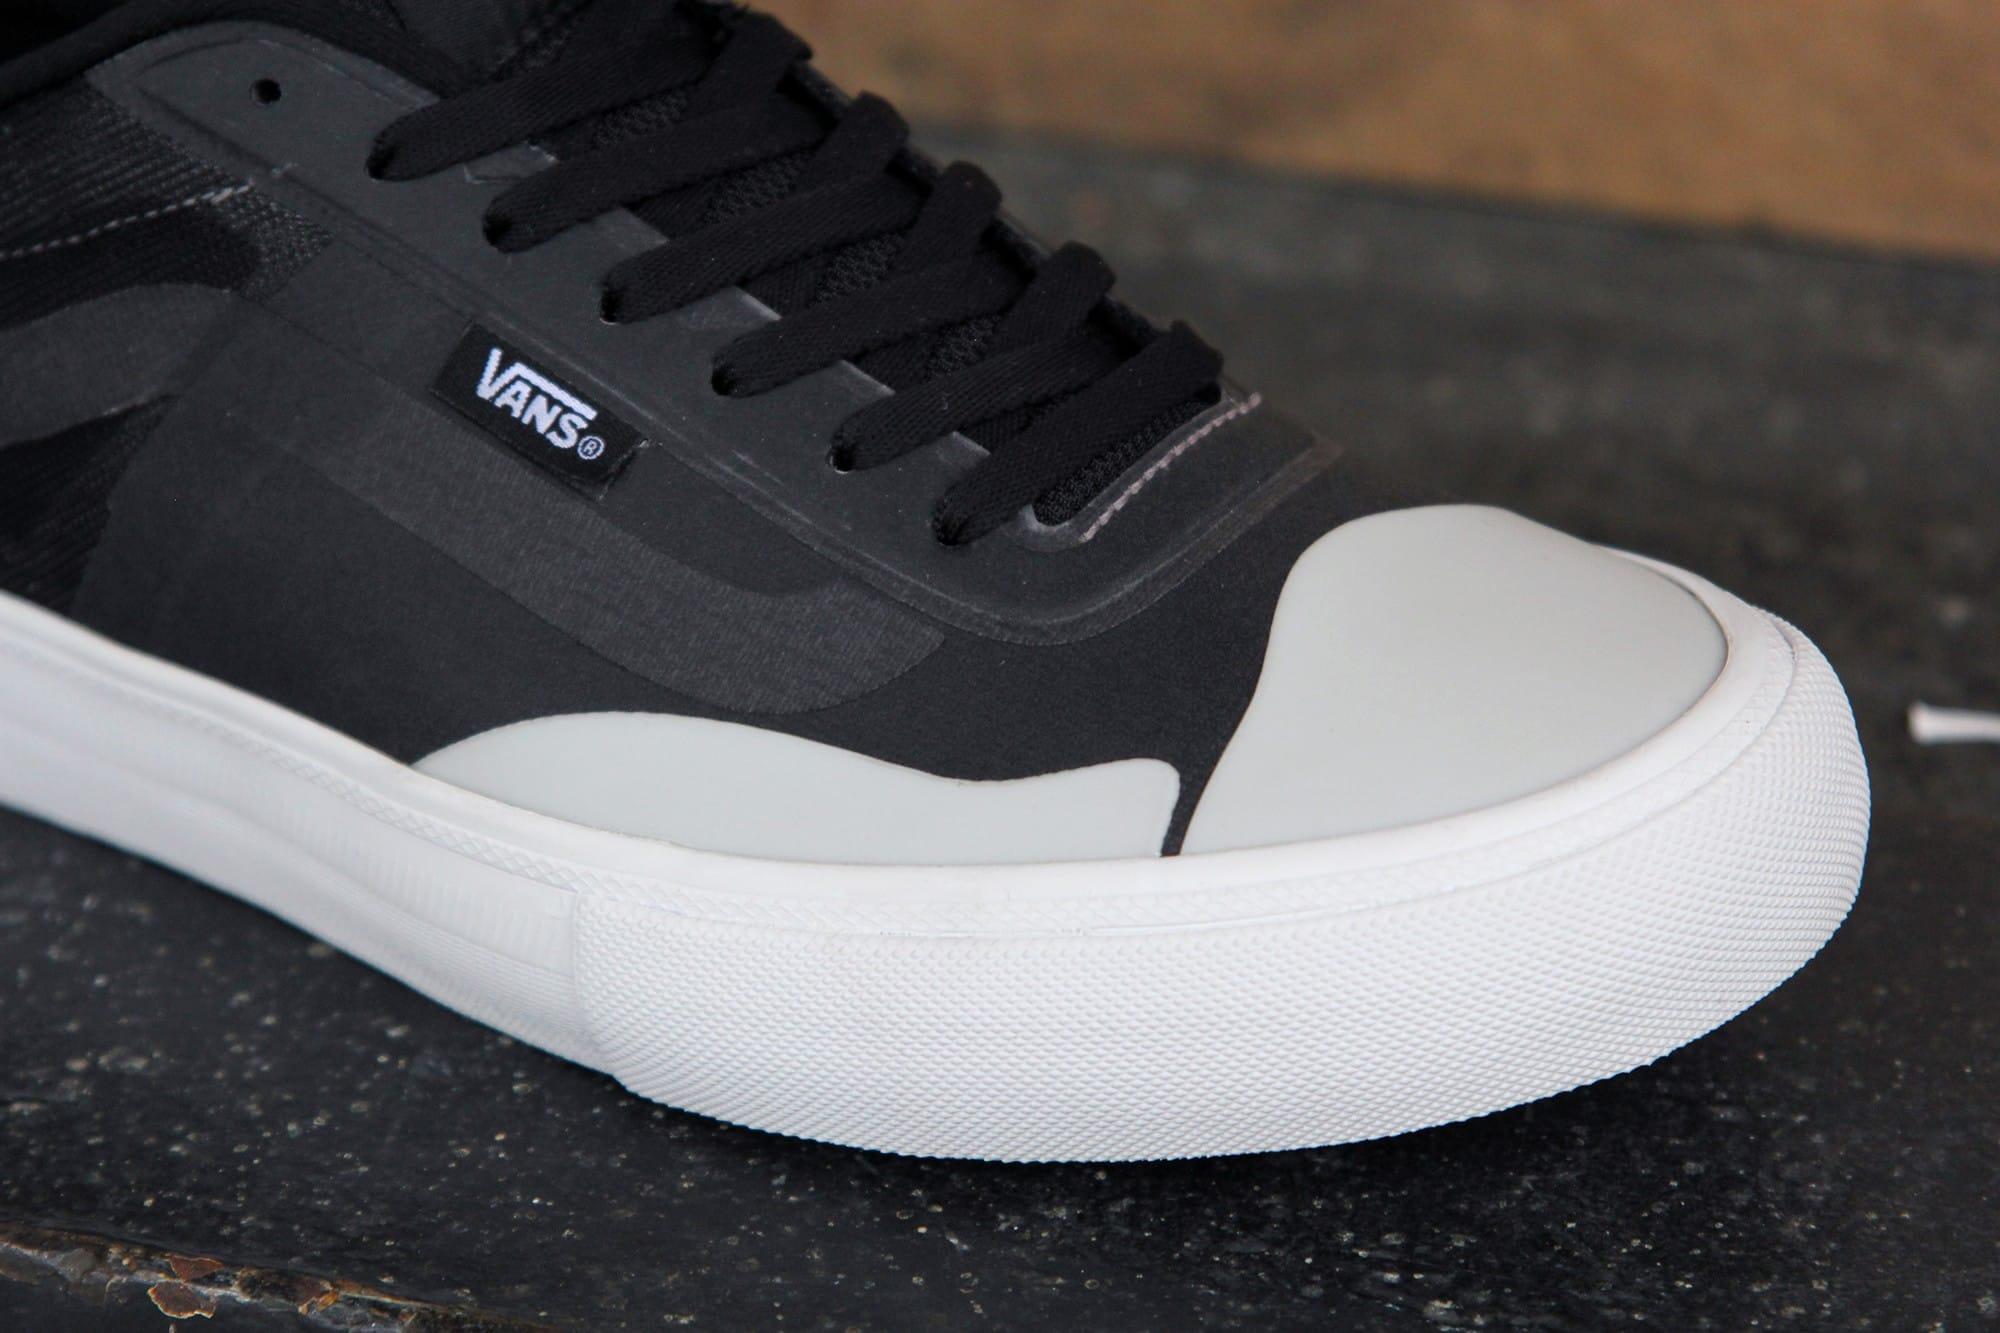 Skate shoes 2017 - Shop Vans Av Rapidweld Pro Lite Skate Shoes